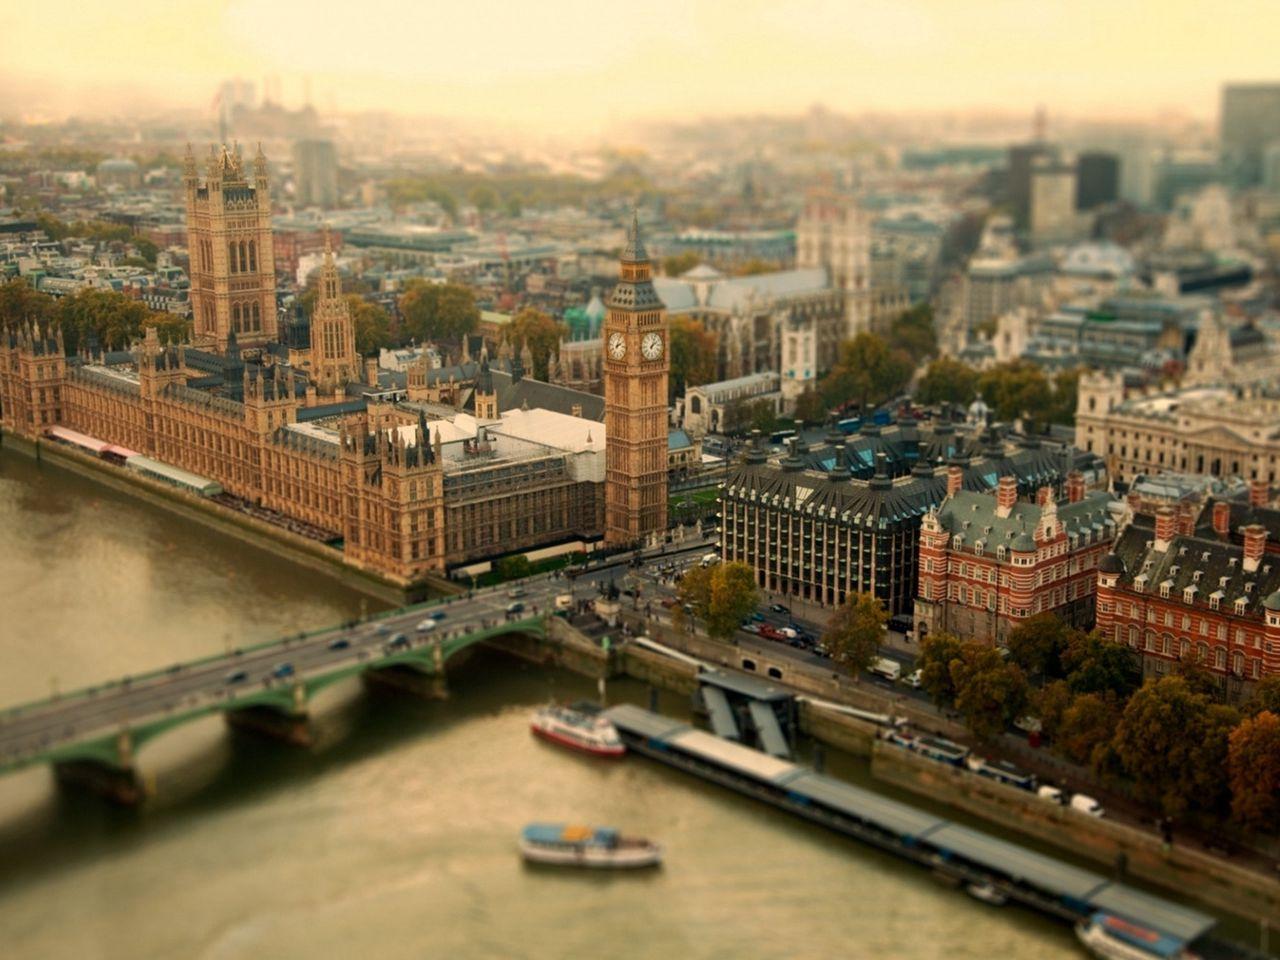 1280x960 Wallpaper london, uk, city, tower bridge